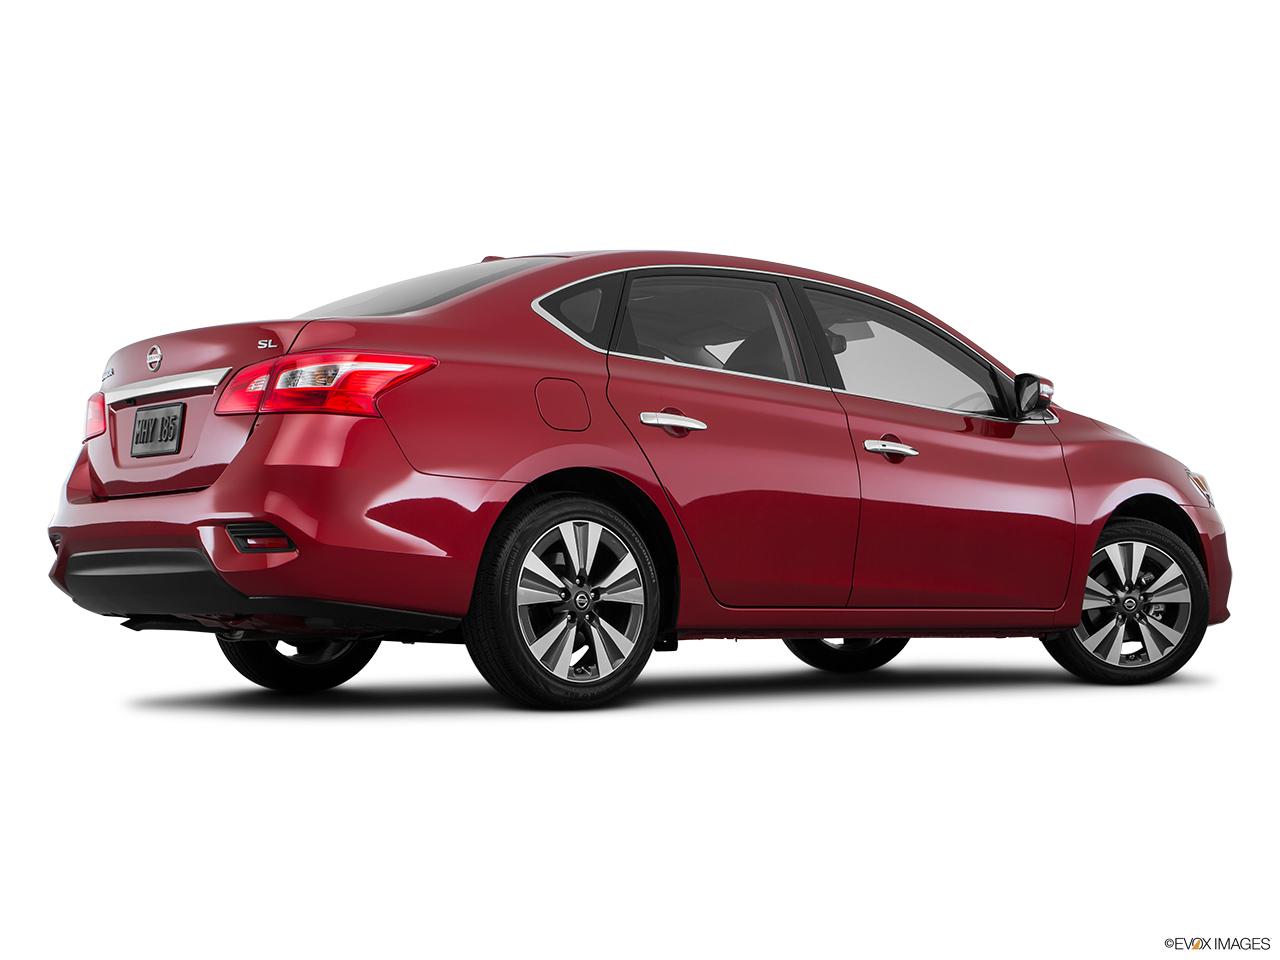 Nissan Sentra 2018 Egypt >> Car Pictures List for Nissan Sentra 2016 1.8L SL Premium (UAE) | YallaMotor